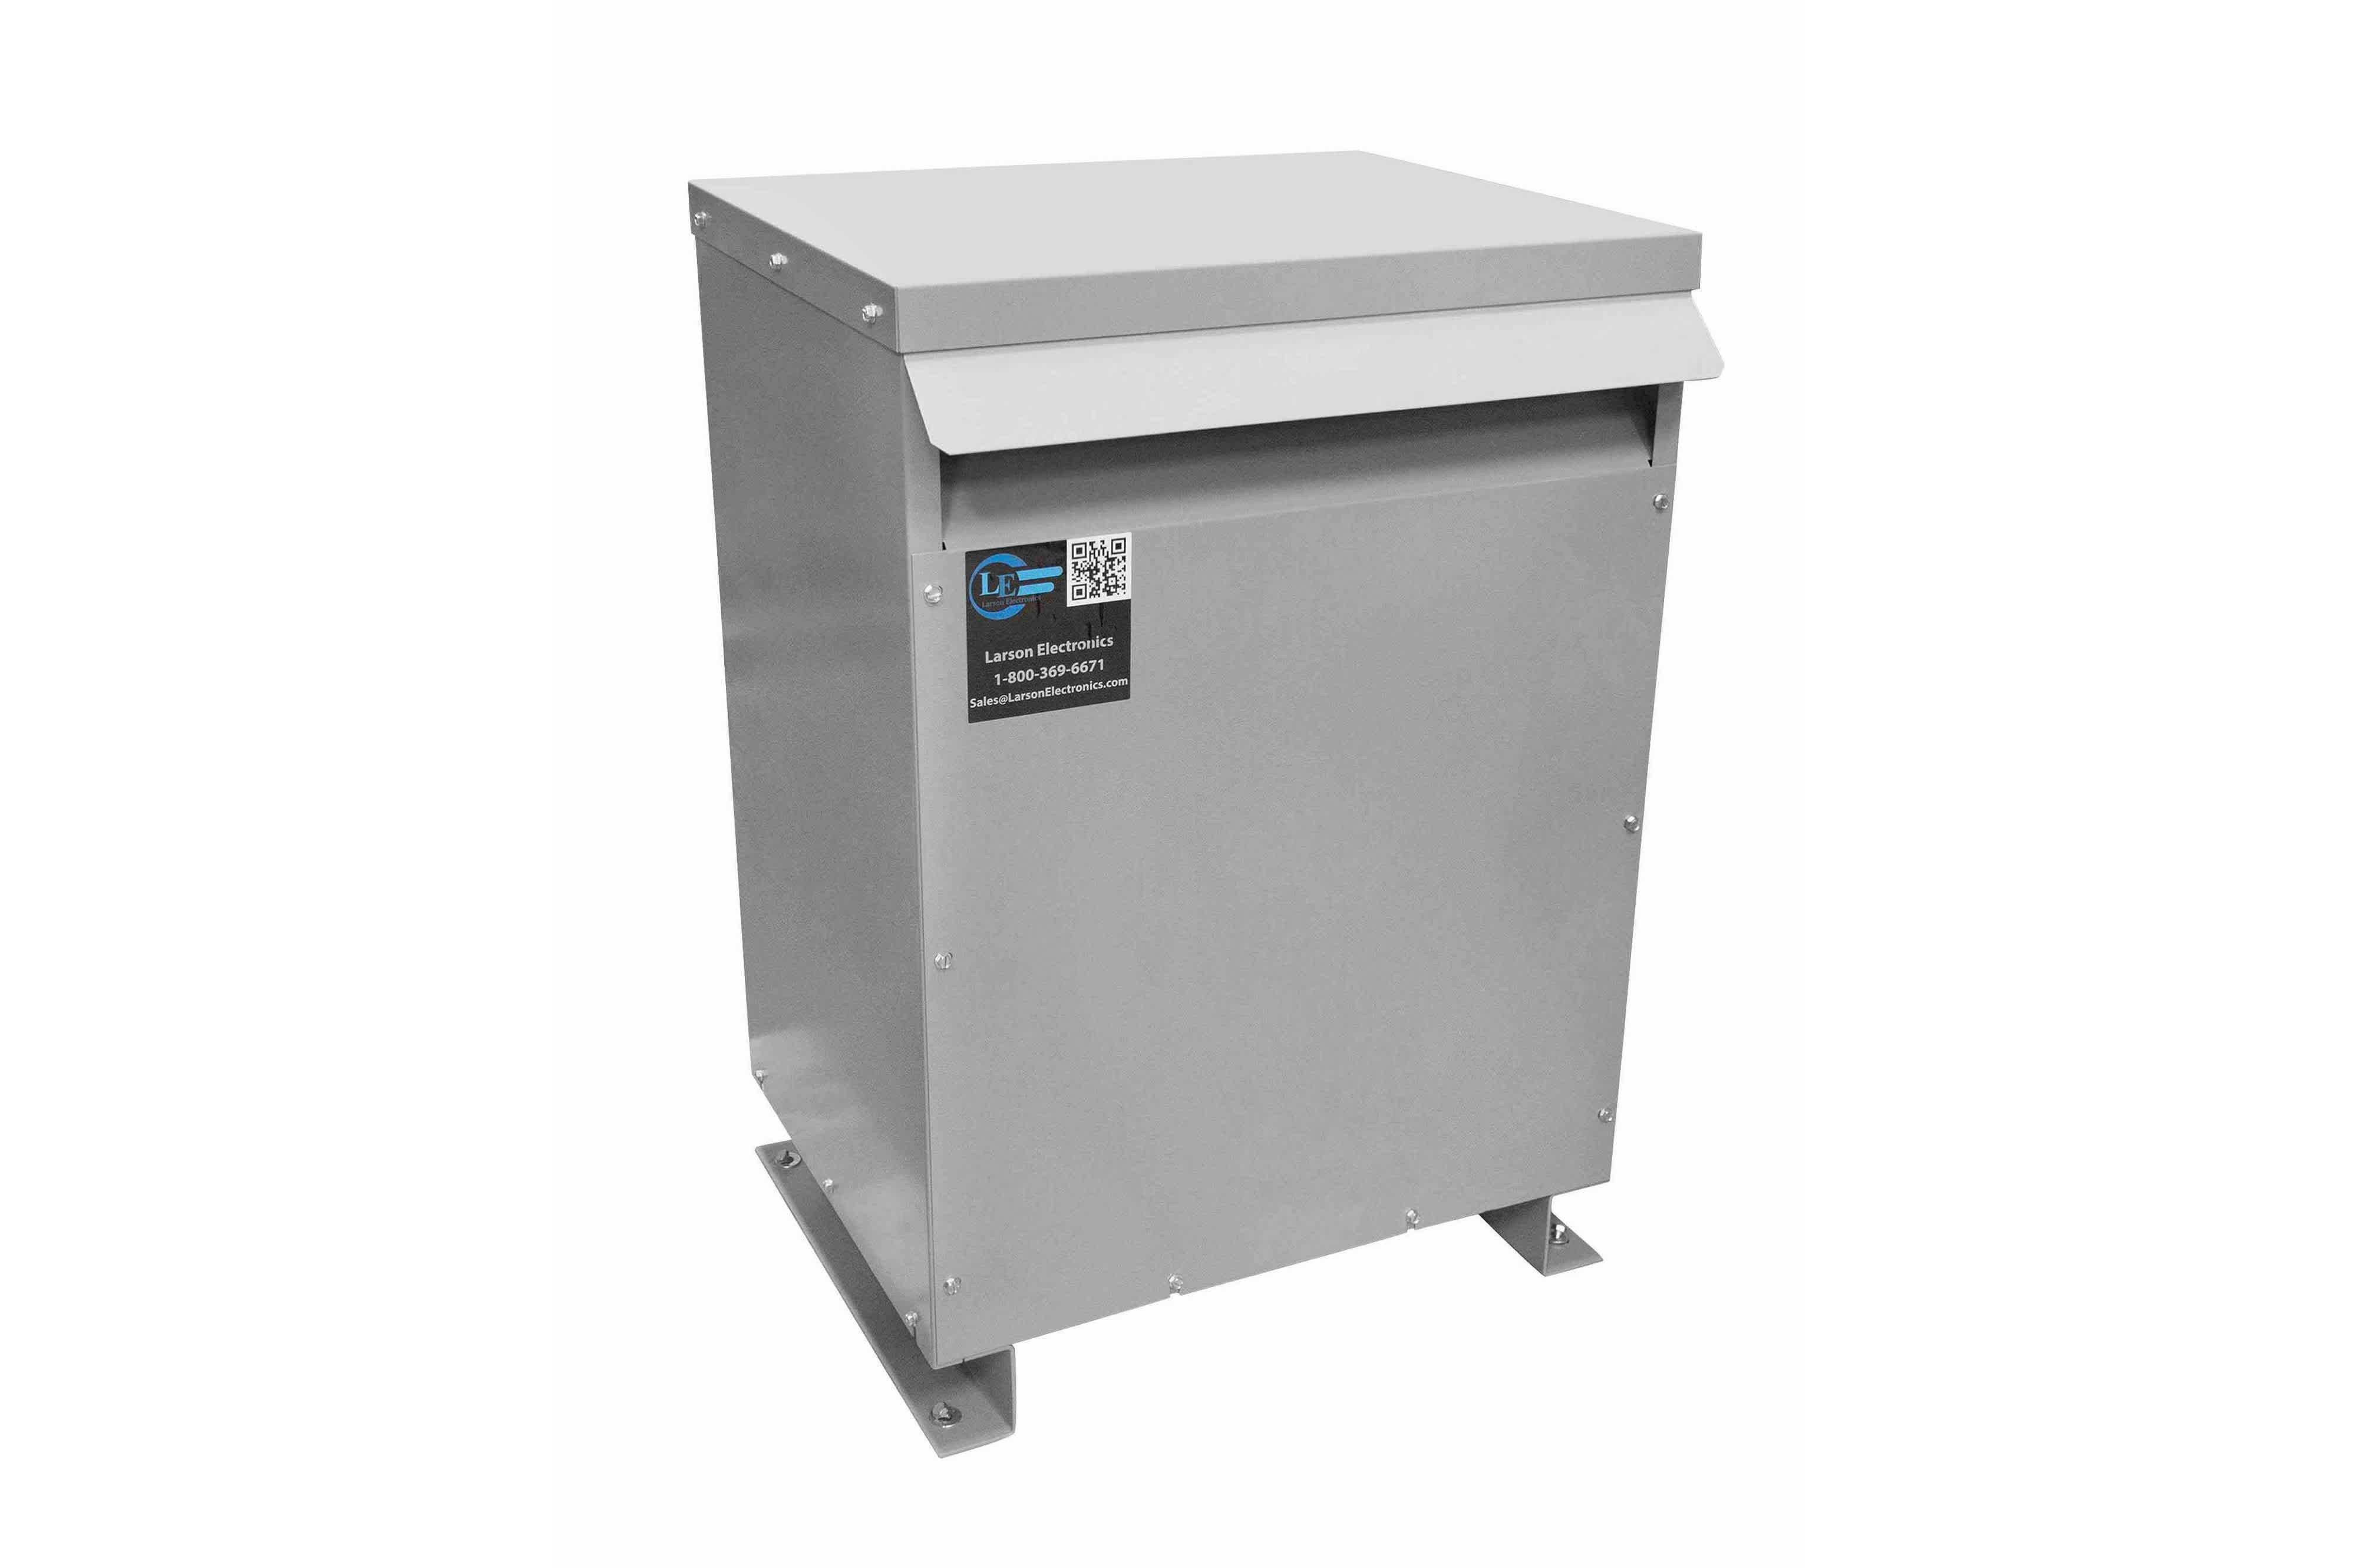 80 kVA 3PH Isolation Transformer, 600V Wye Primary, 460V Delta Secondary, N3R, Ventilated, 60 Hz